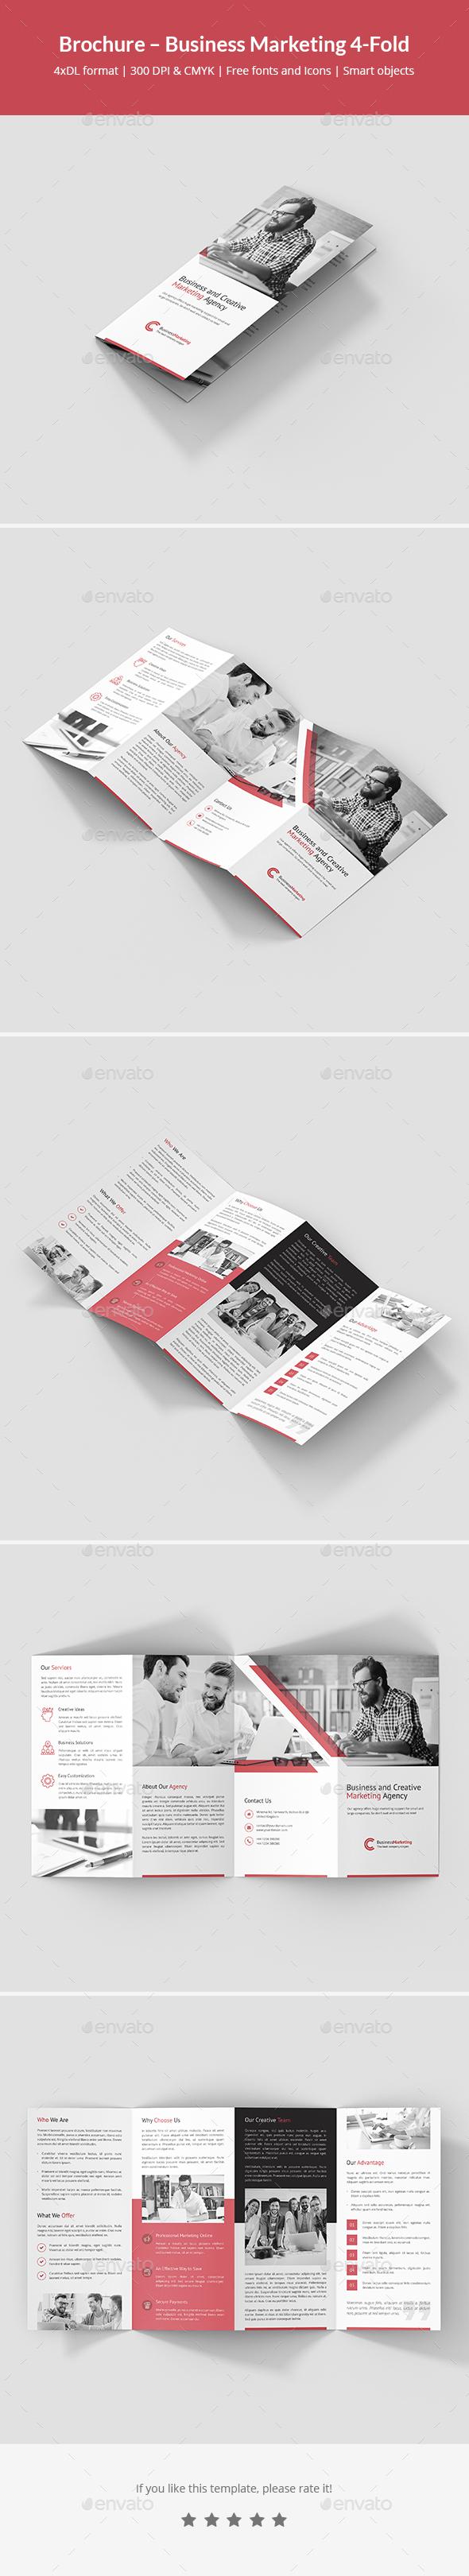 Brochure – Business Marketing 4-Fold - Corporate Brochures